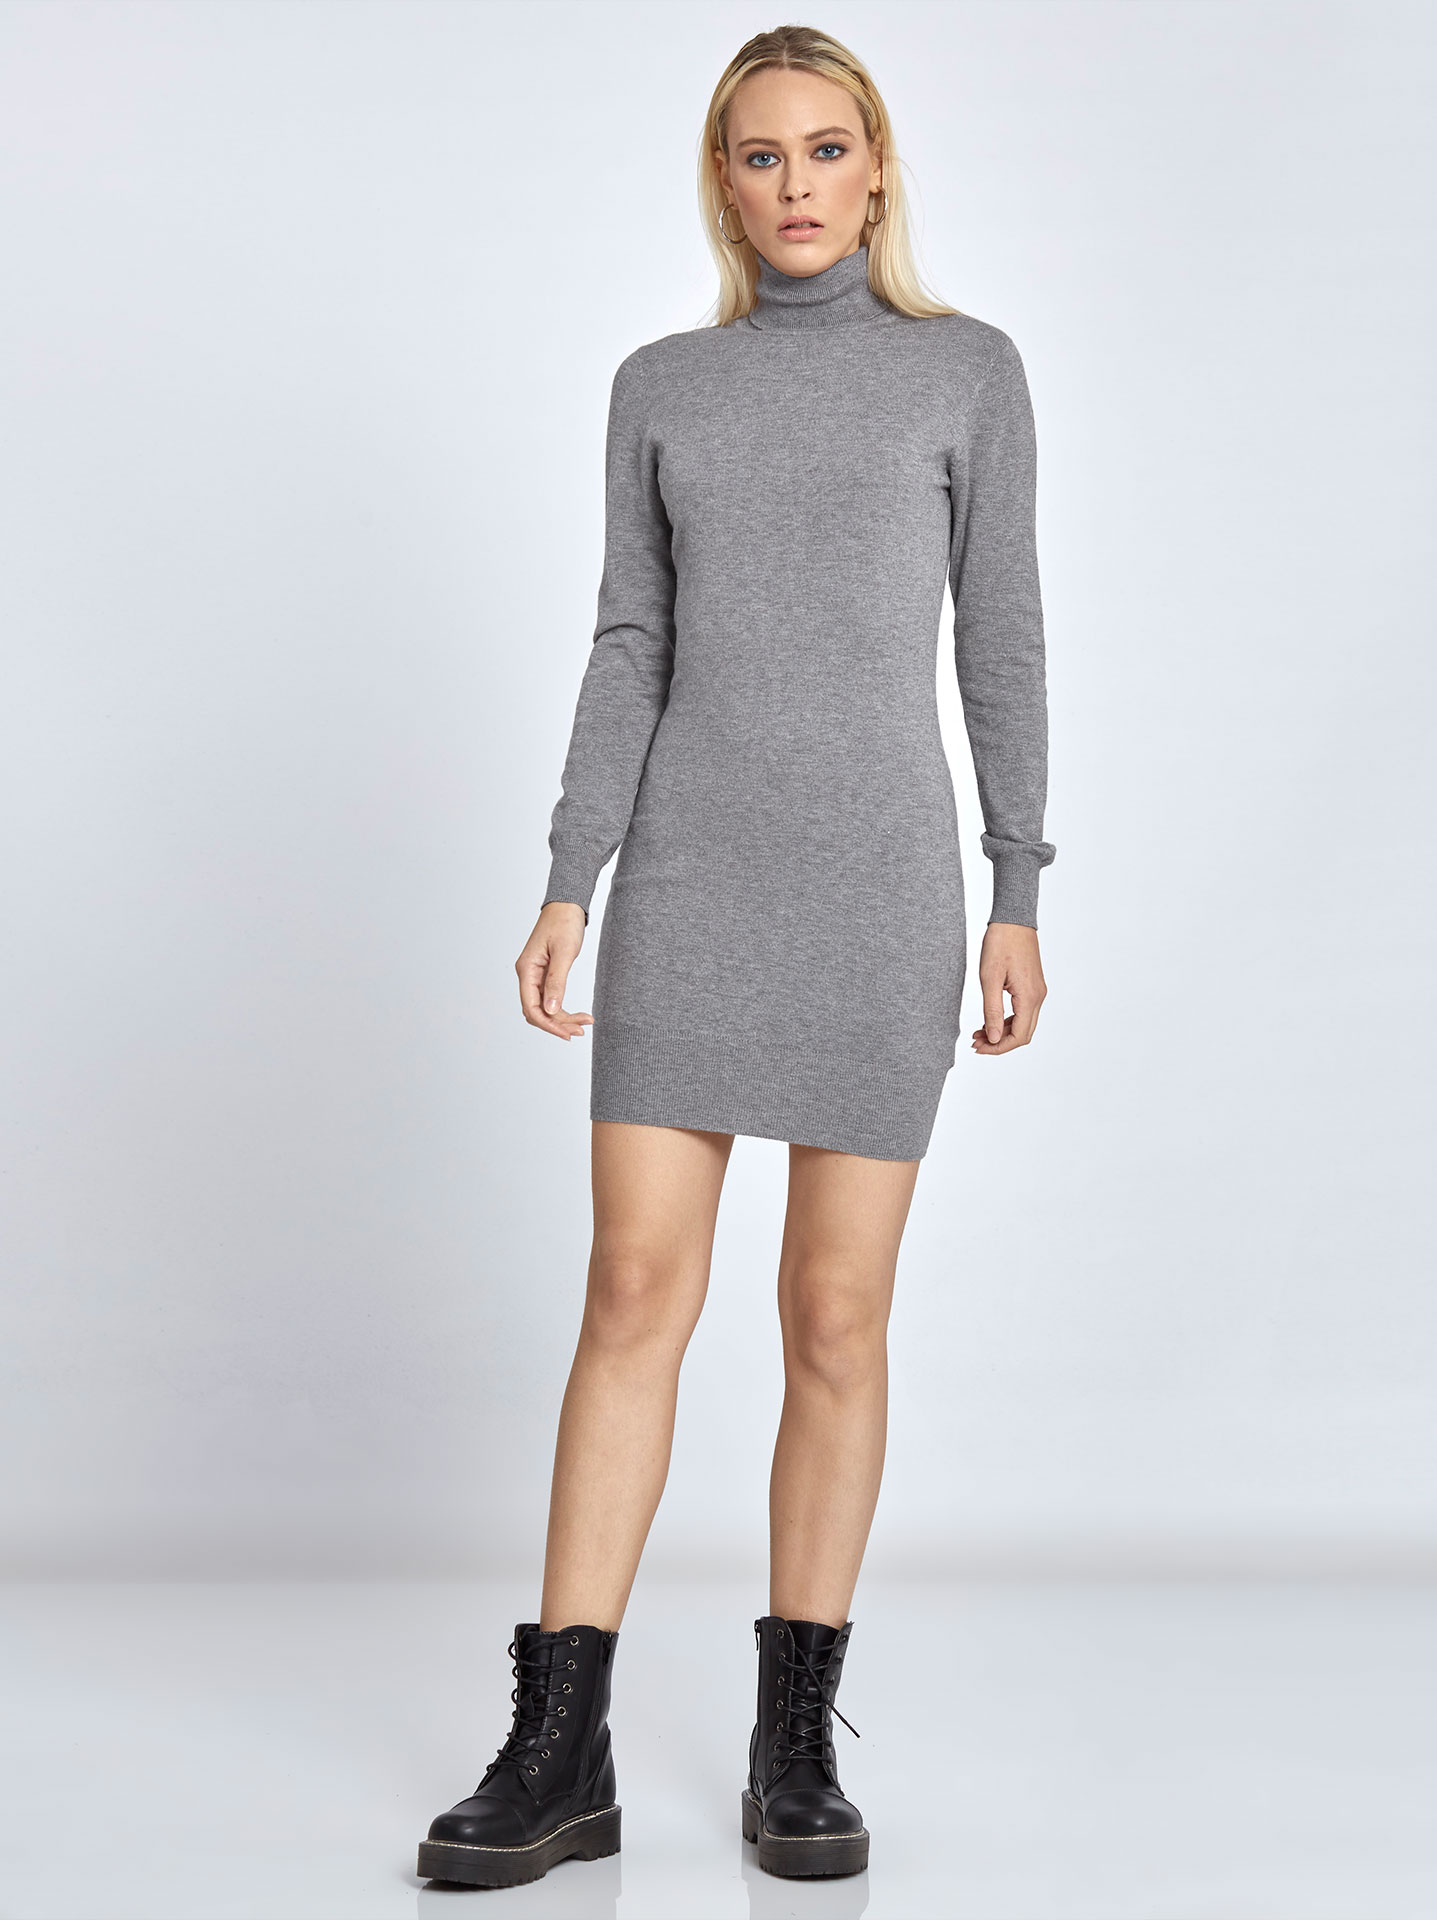 609b113d3982 Mini turtleneck sweater dress in grey